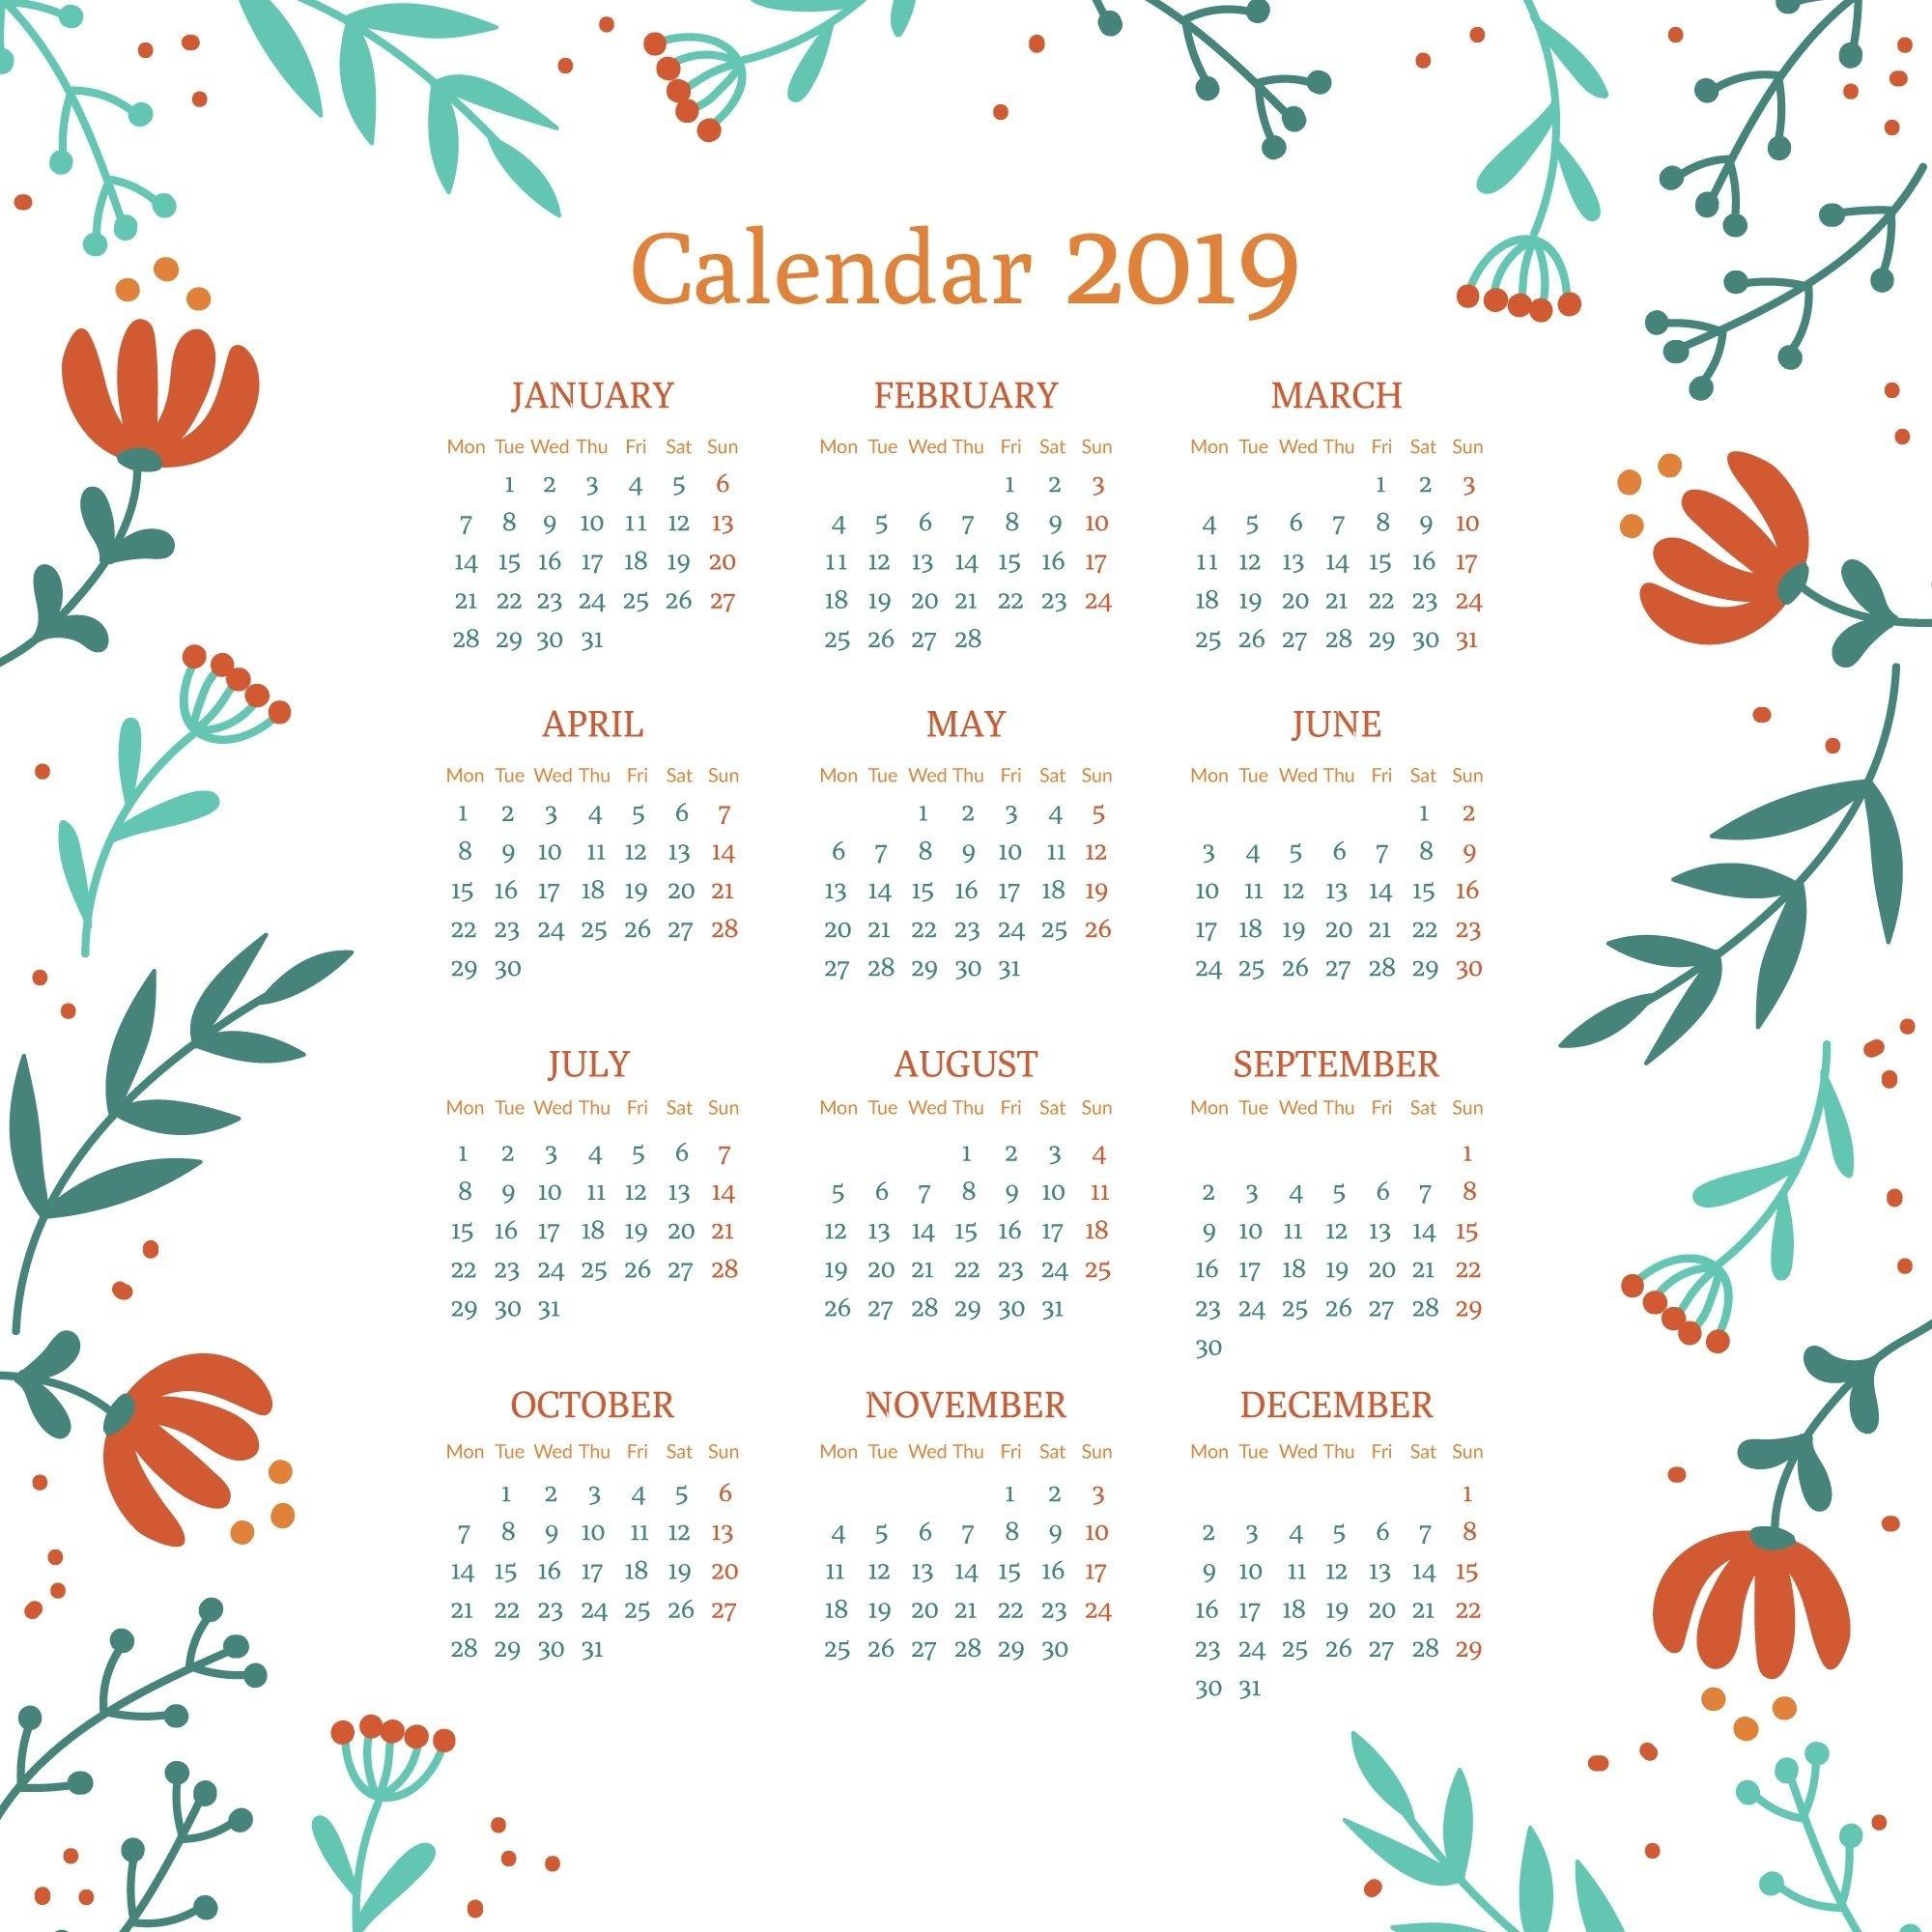 Calendar Printable 2019 Template | Printable Calendar